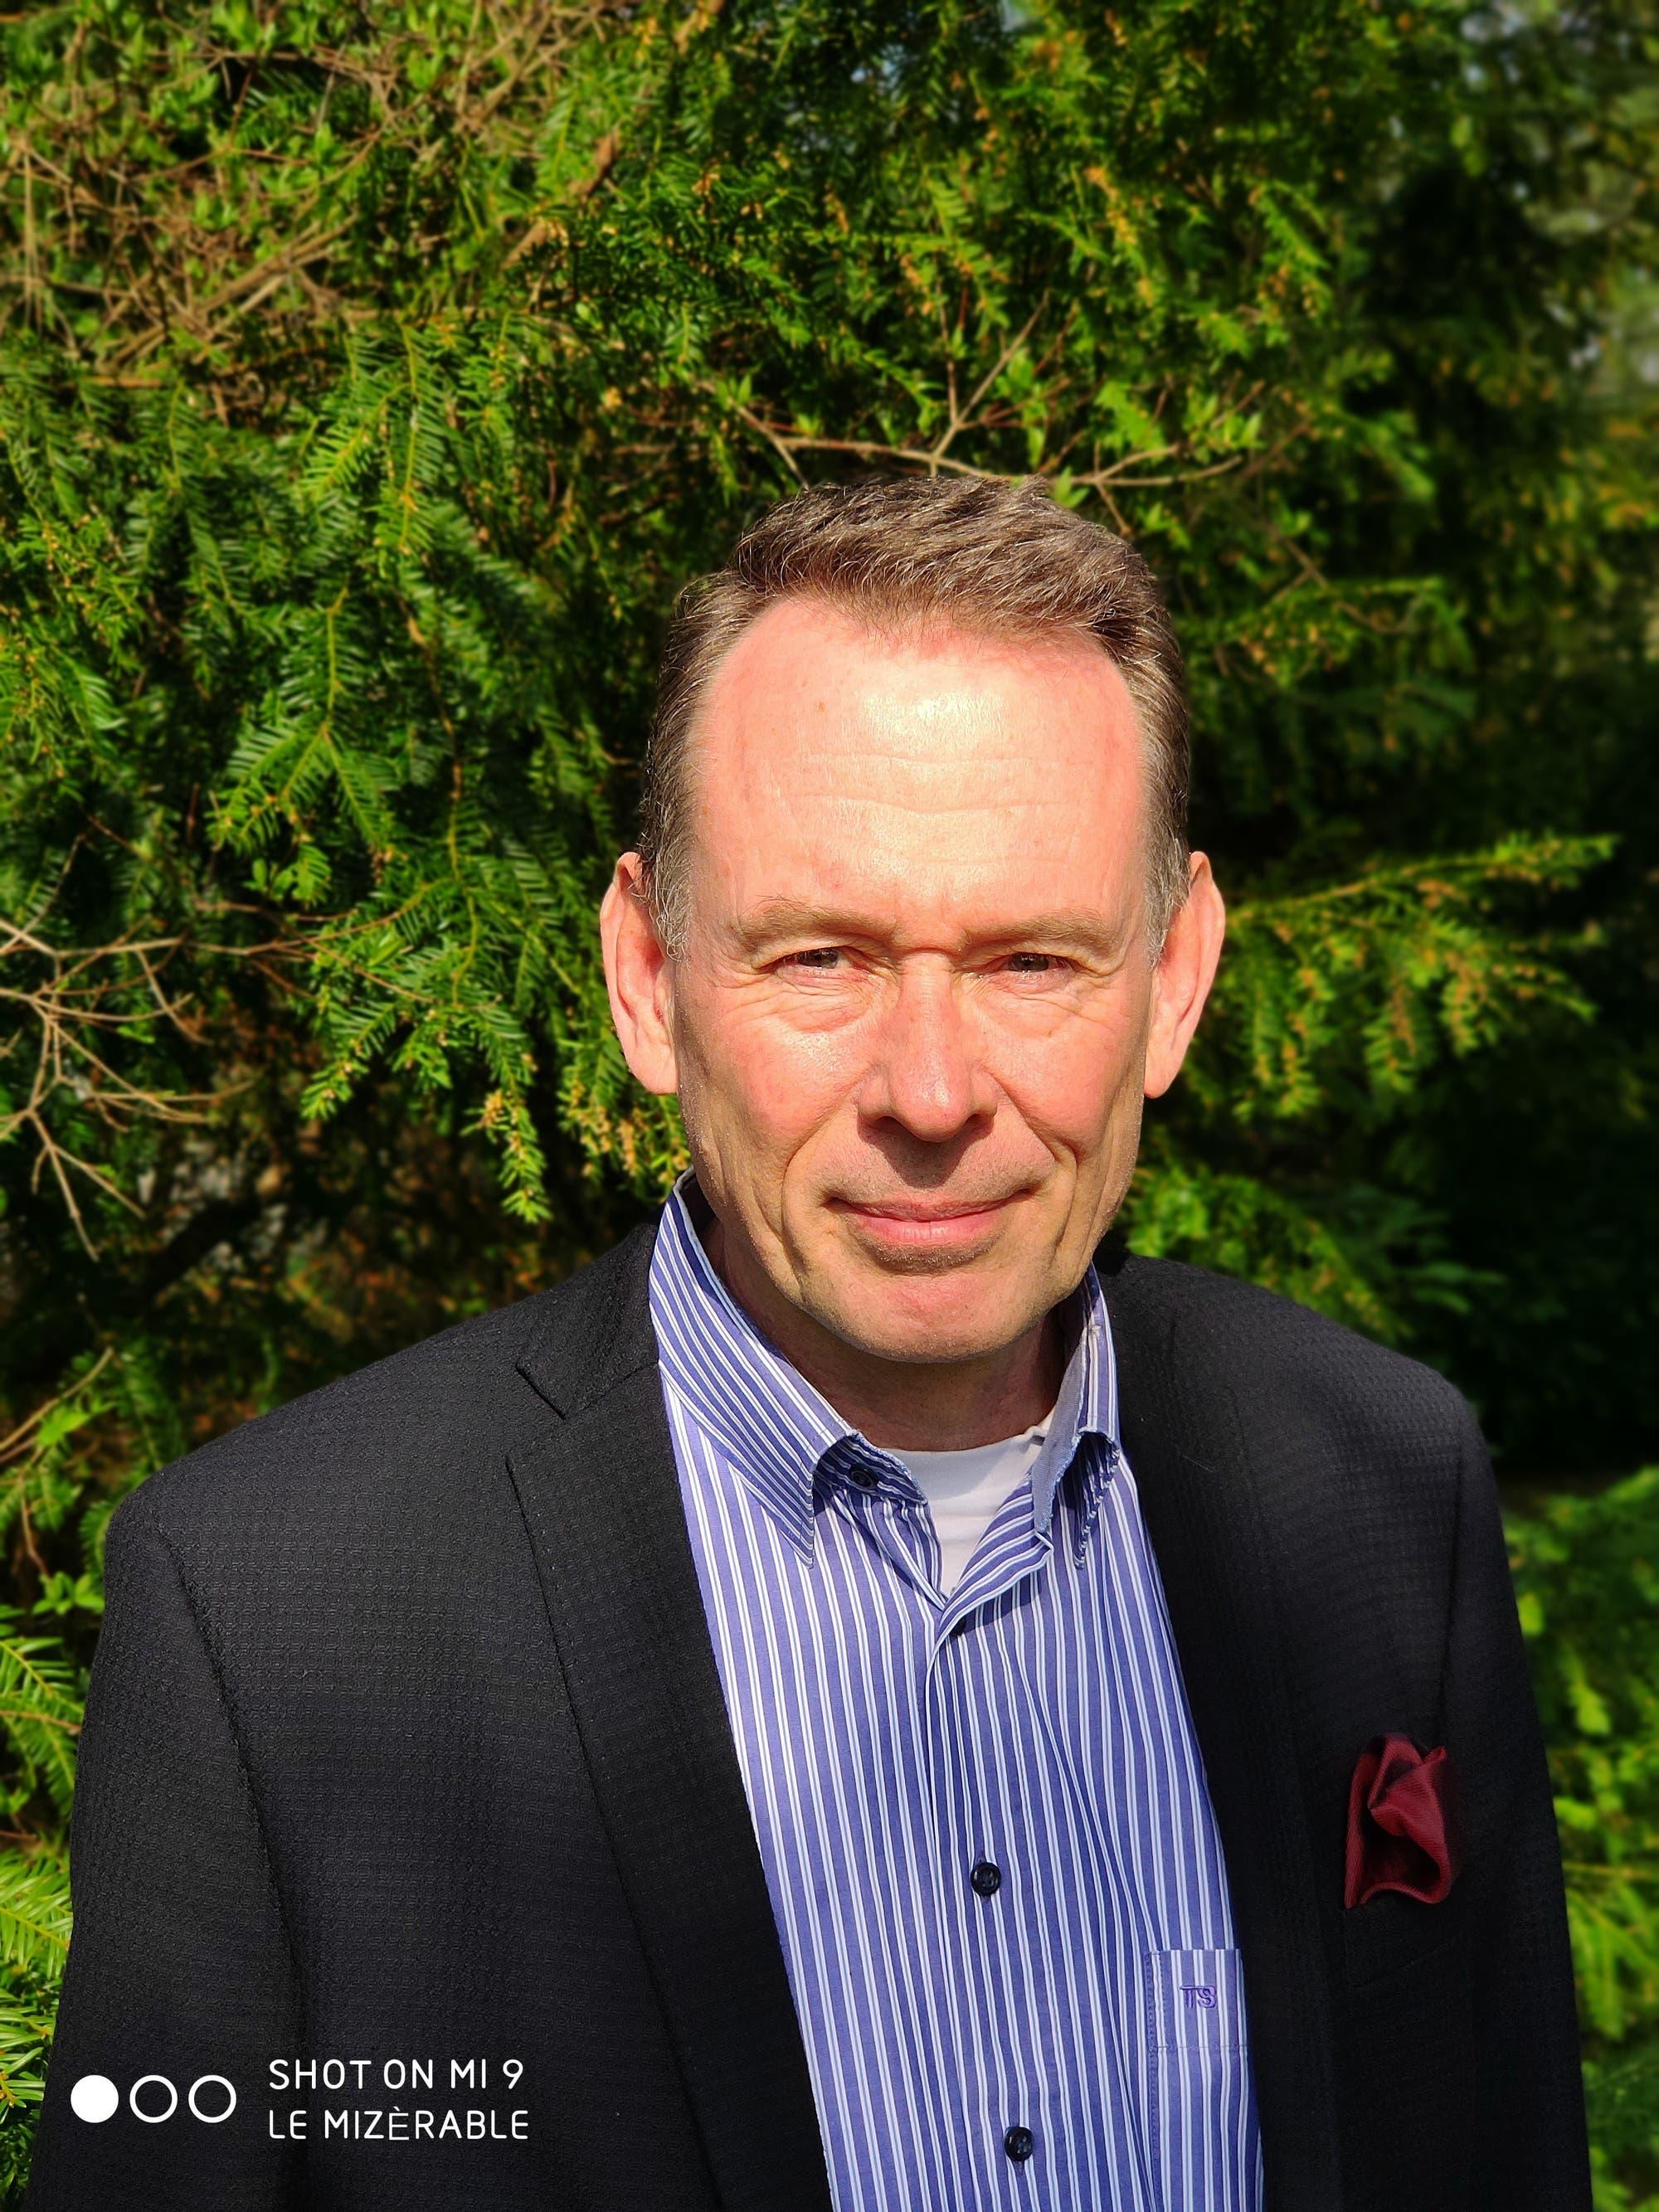 Hans-Guido Mücke